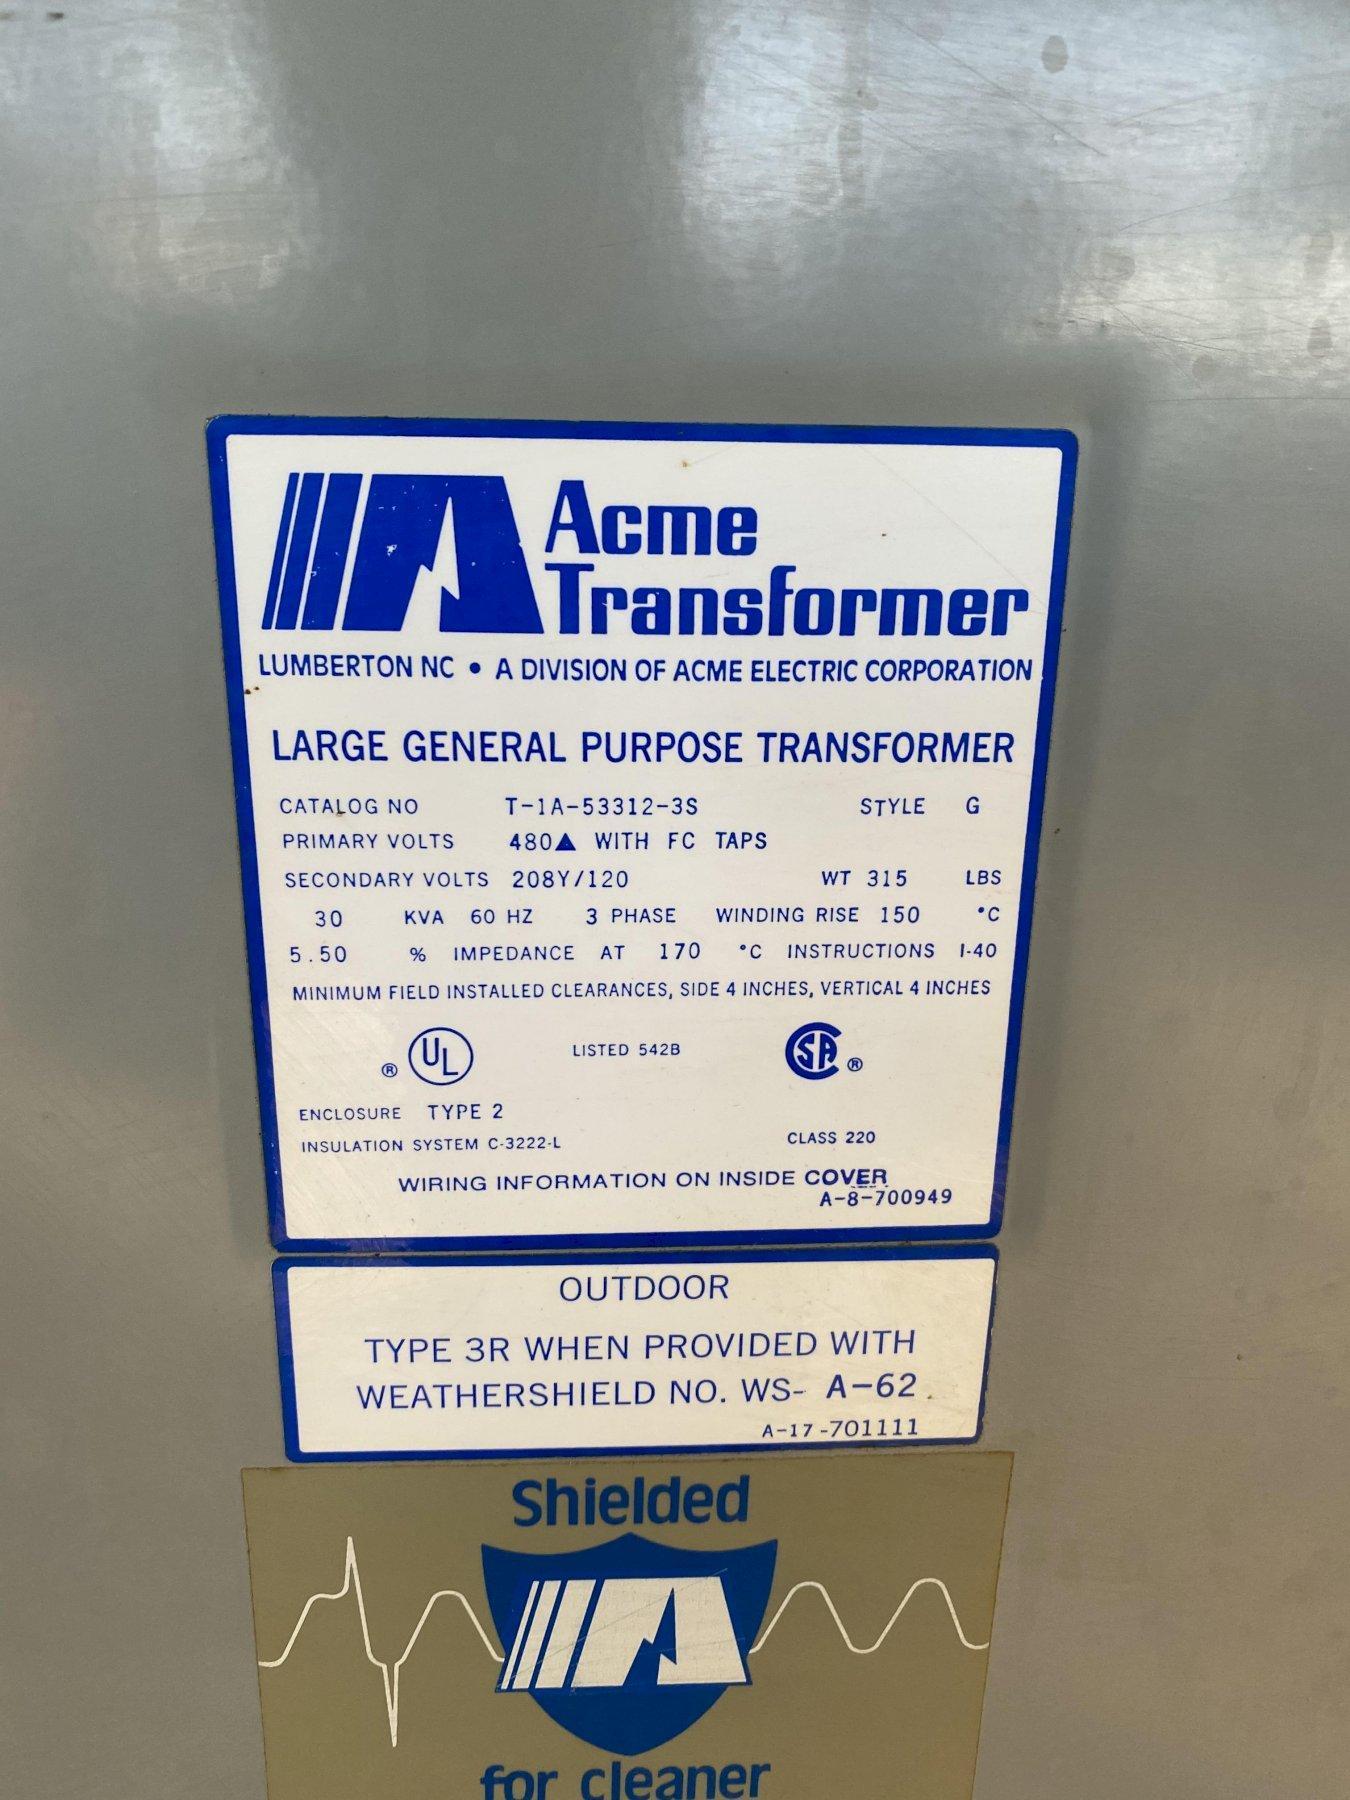 30 KVA ACME 480 PRIMARY, 208/120 SECONDARY STEPDOWN TRANSFORMER. STOCK # 1160720